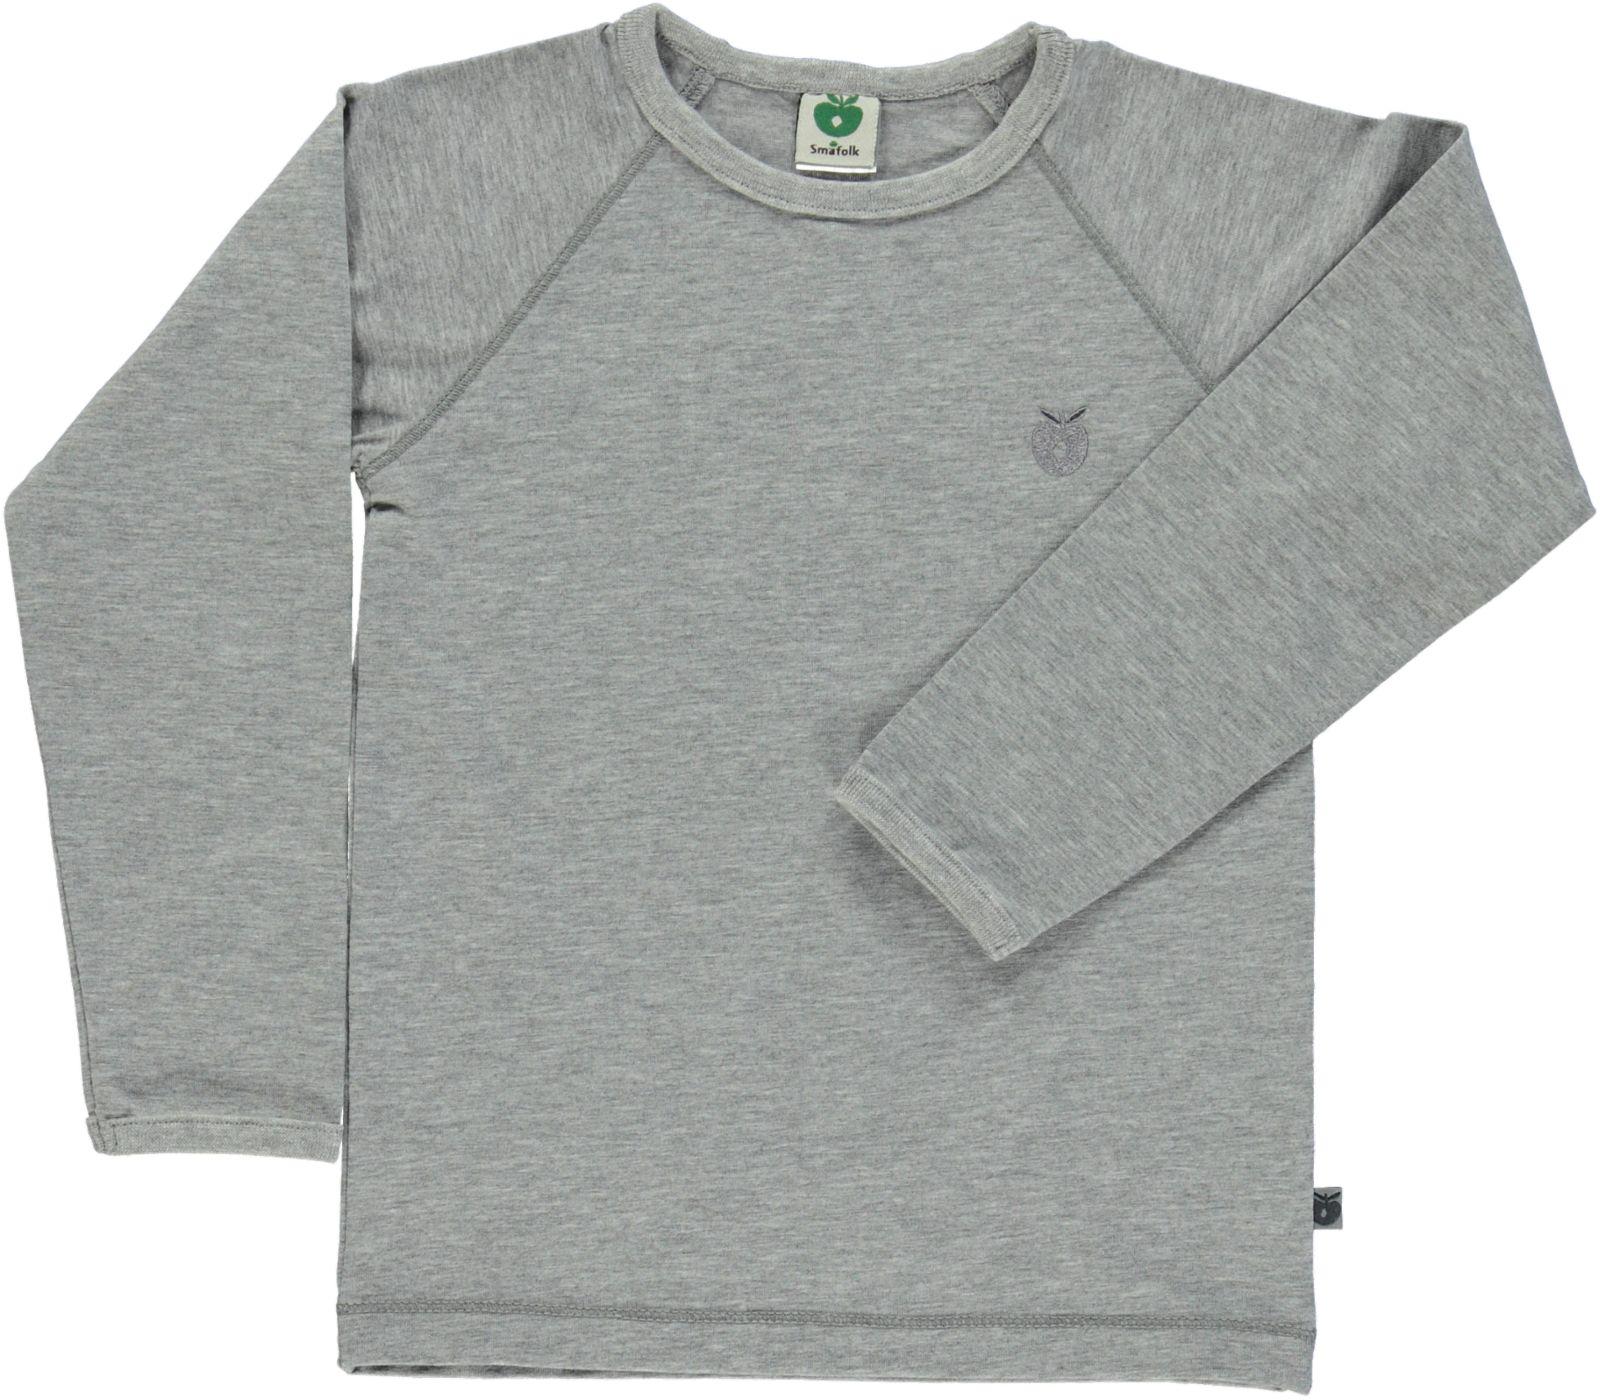 Småfolk - Organic Basic Longsleved T-Shirt - Lt. Grey Mix